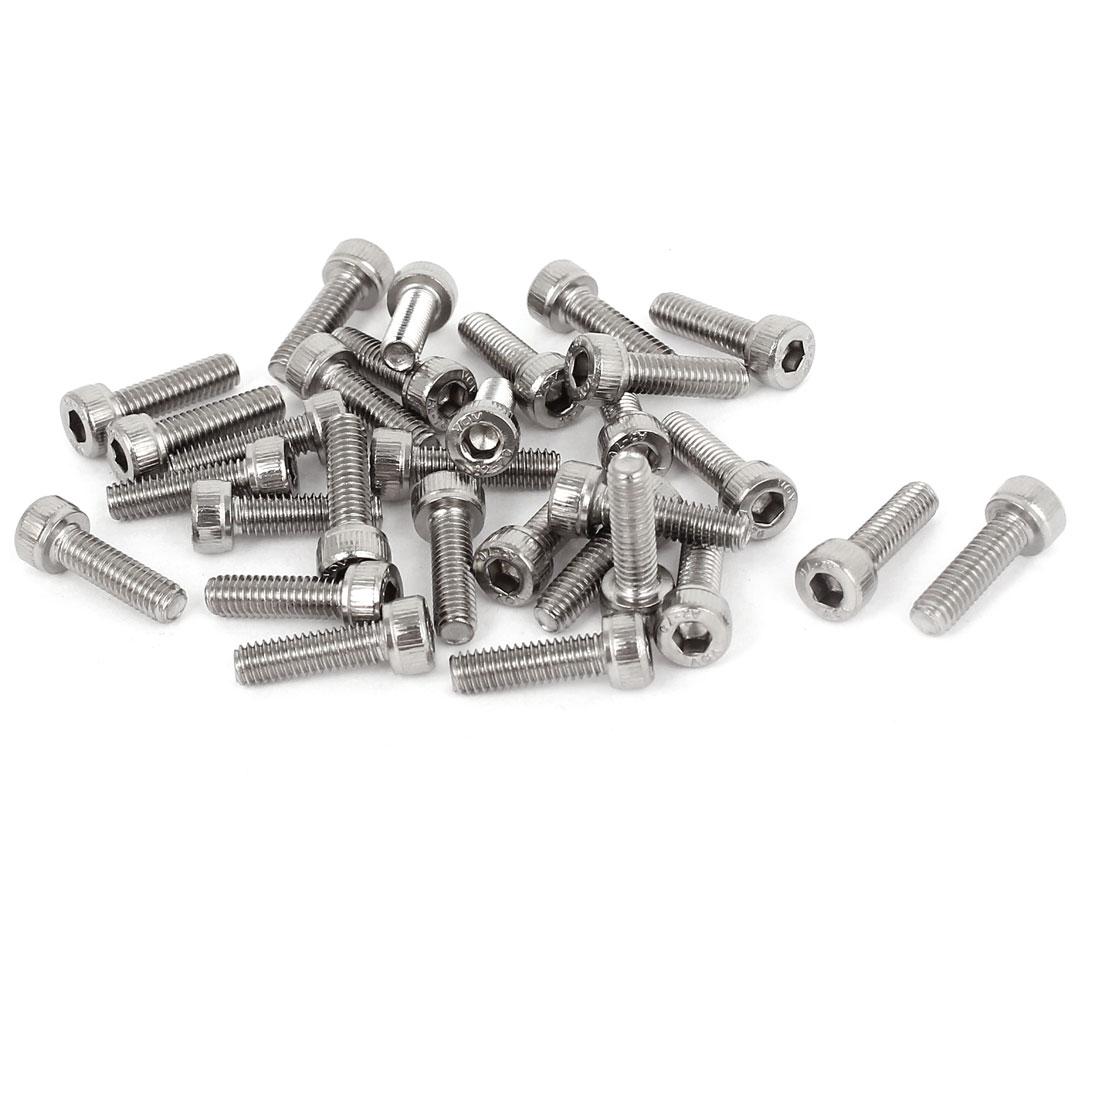 M4x14mm 0.7mm Pitch Stainless Steel Bolts Socket Cap Head Hex Key Screws 30pcs